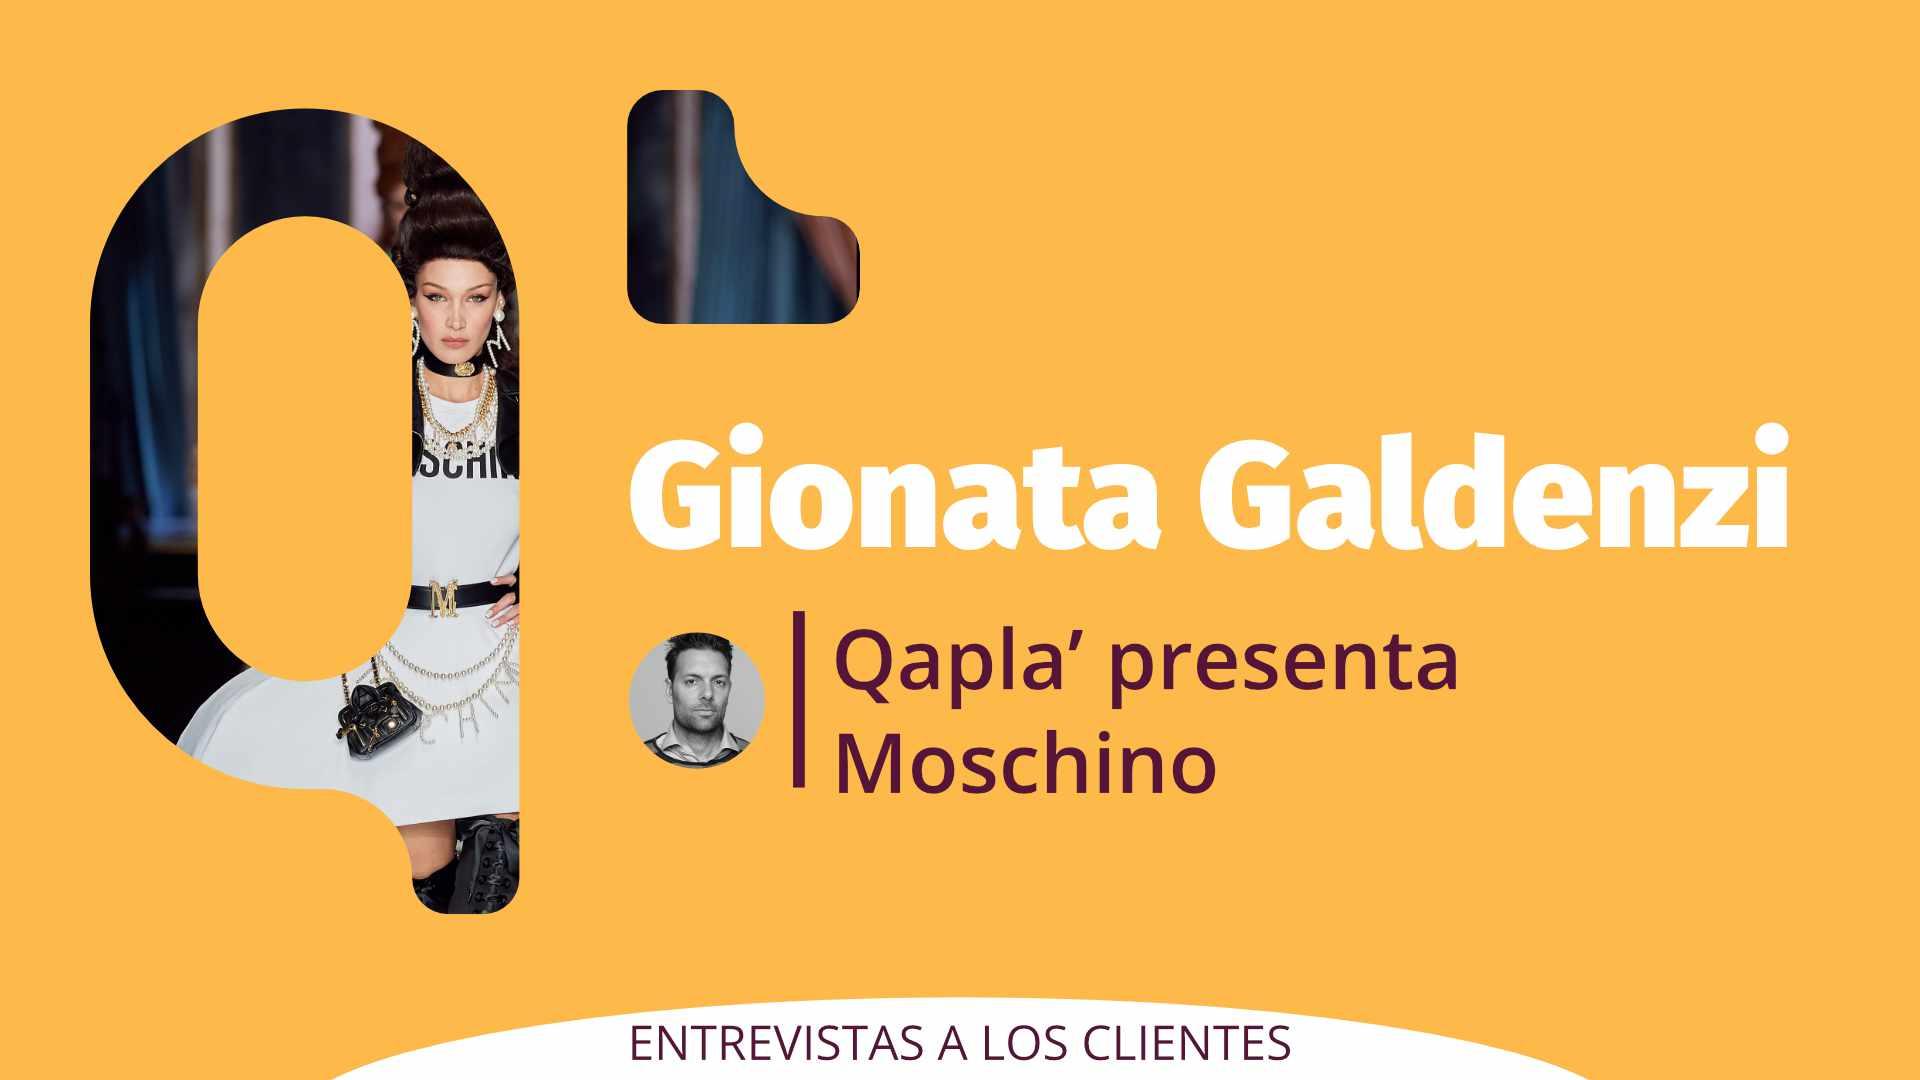 Qapla' presenta Moschino: Entrevista a Gionata Galdenzi